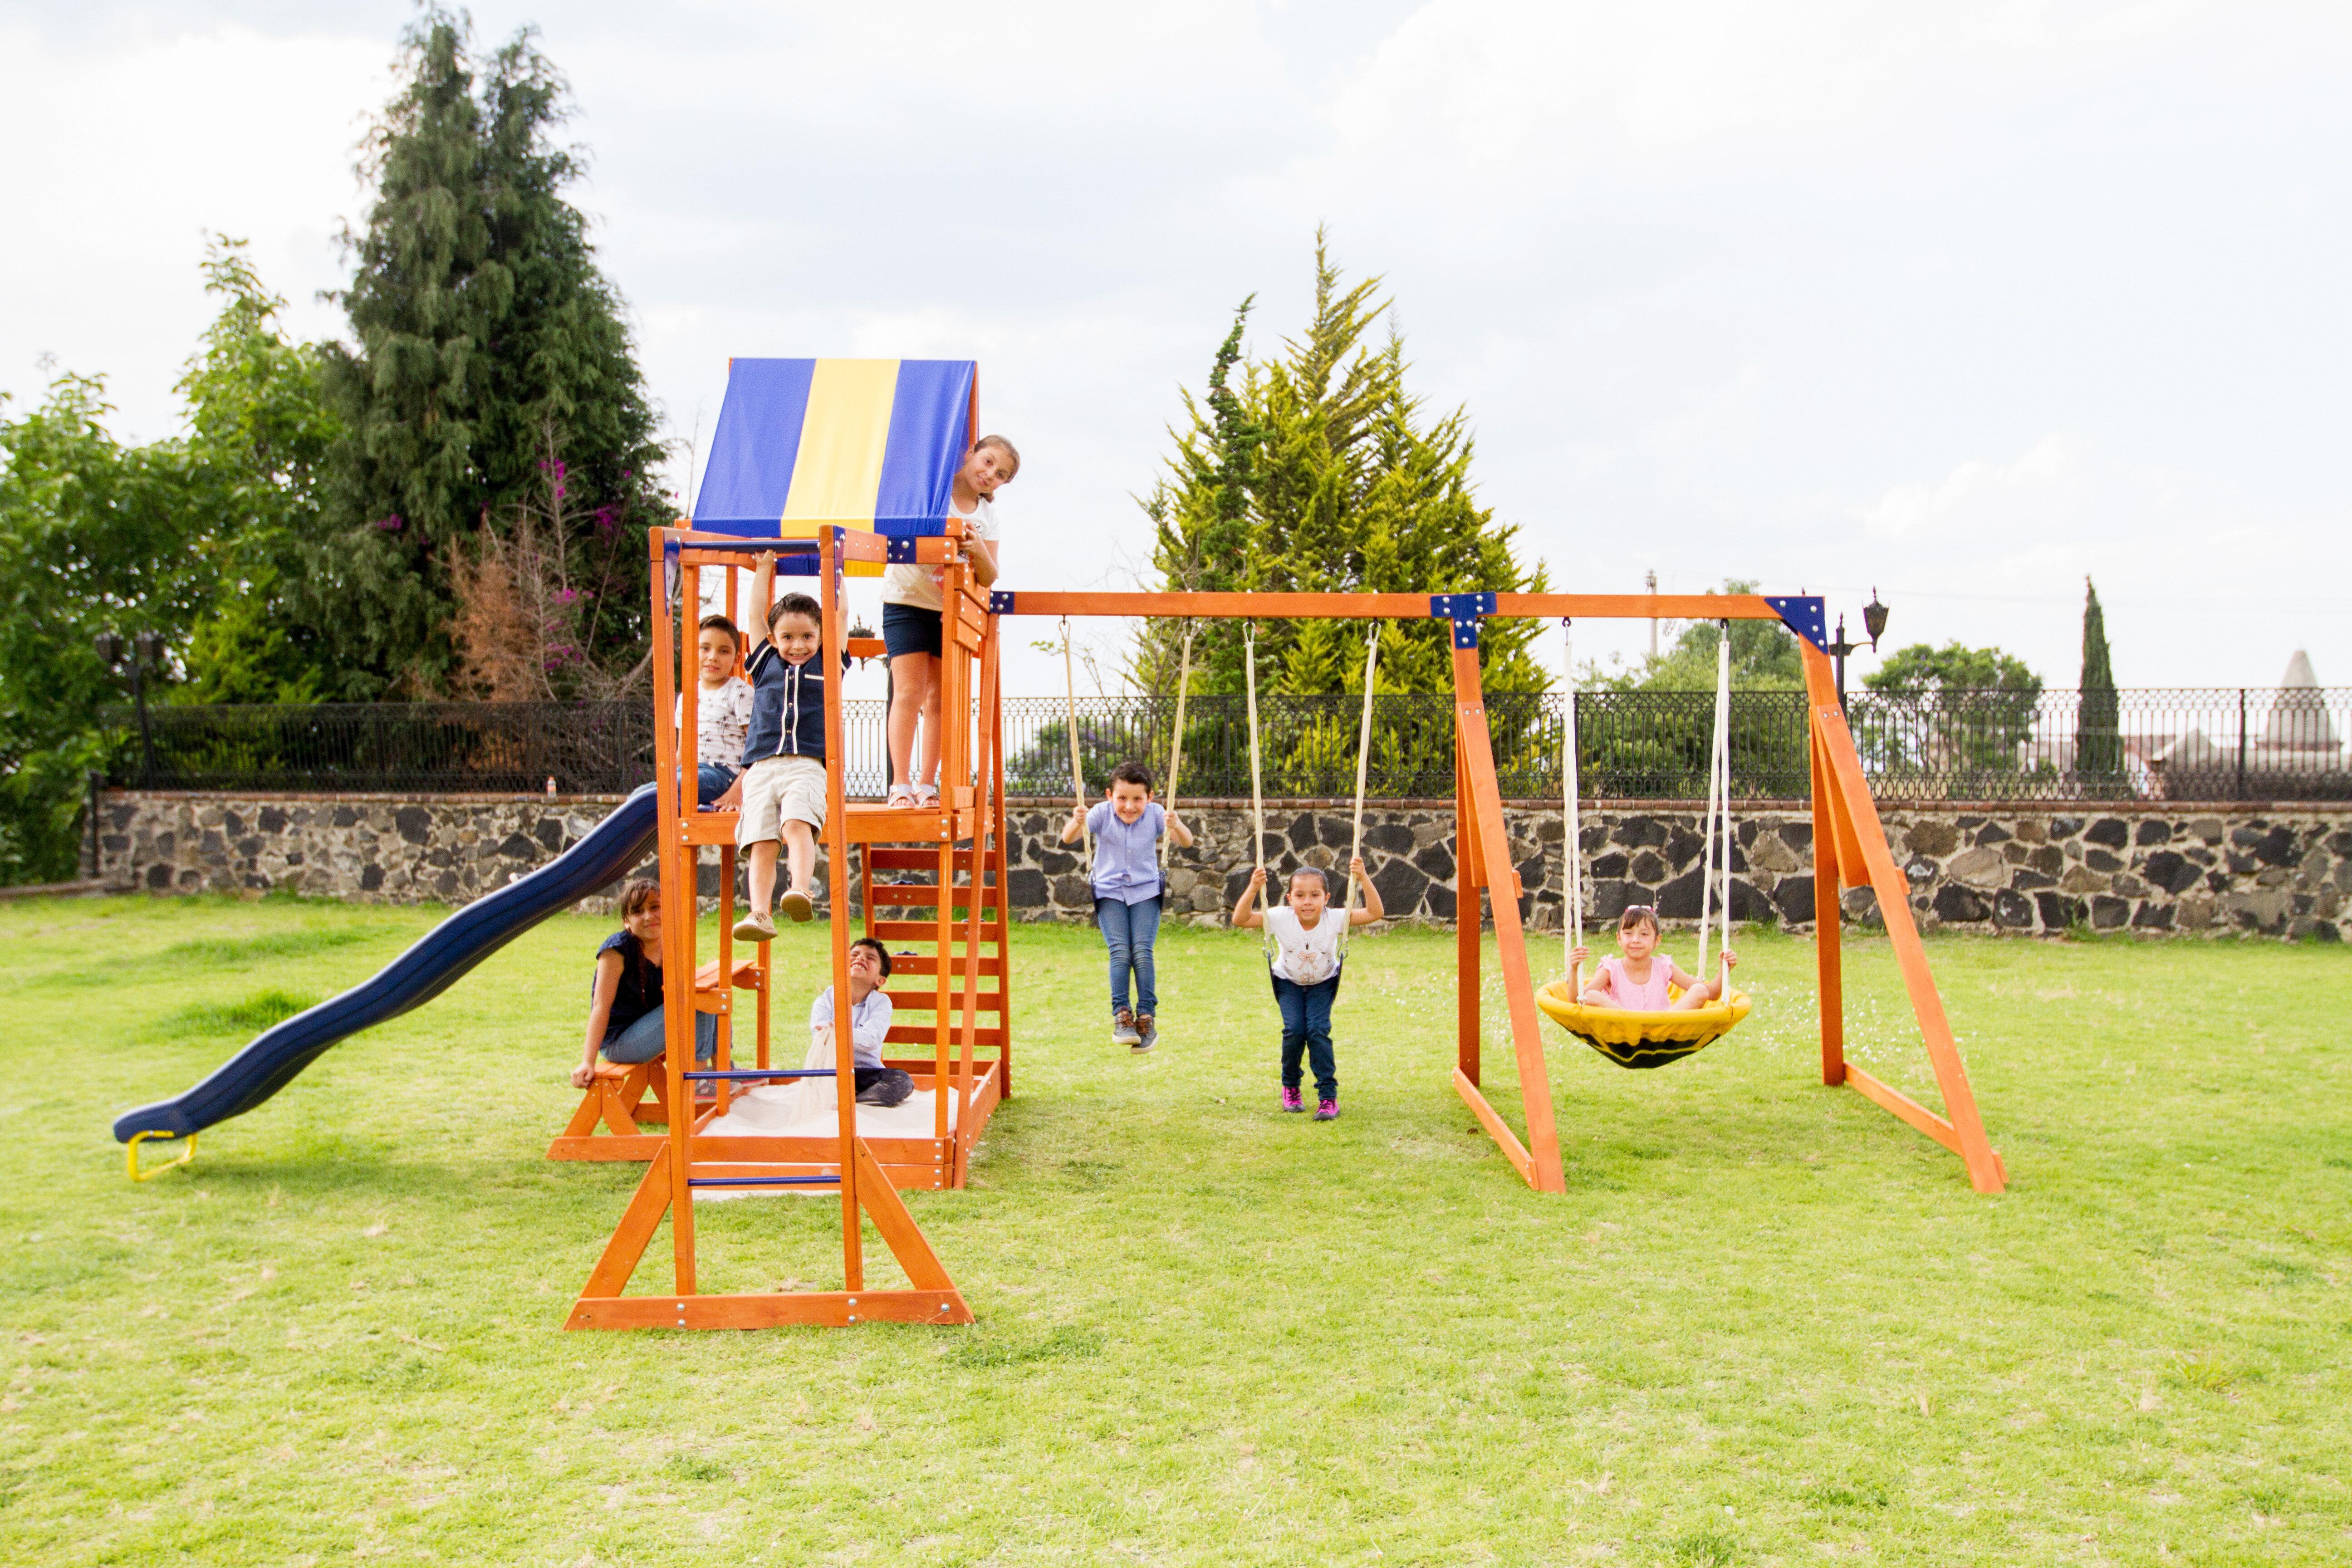 Swing-N-Slide Yellow SWING SEAT Playground Swingset Park Backyard Strap Chain MA